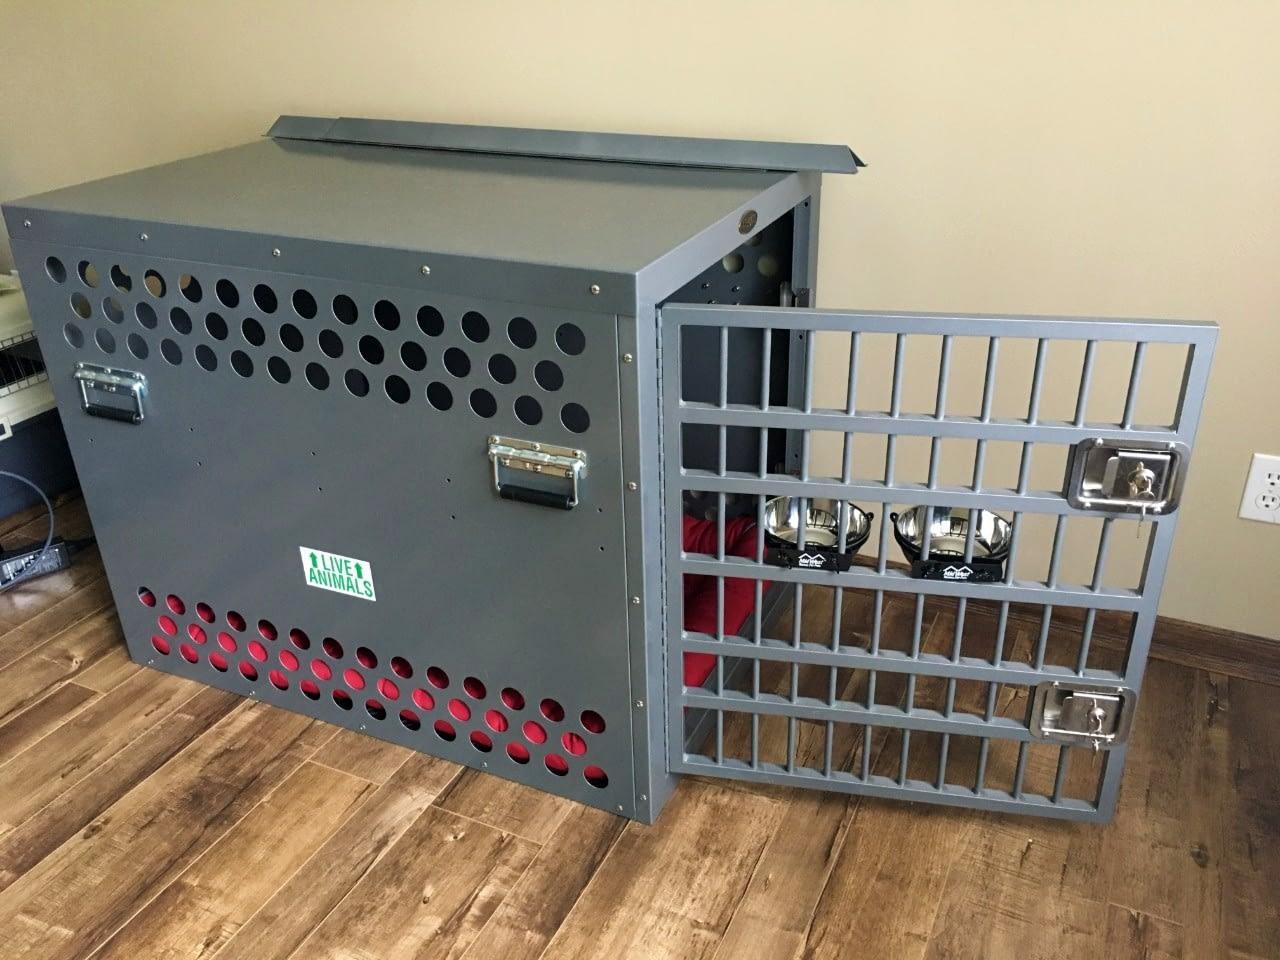 IATA-CR82 crate